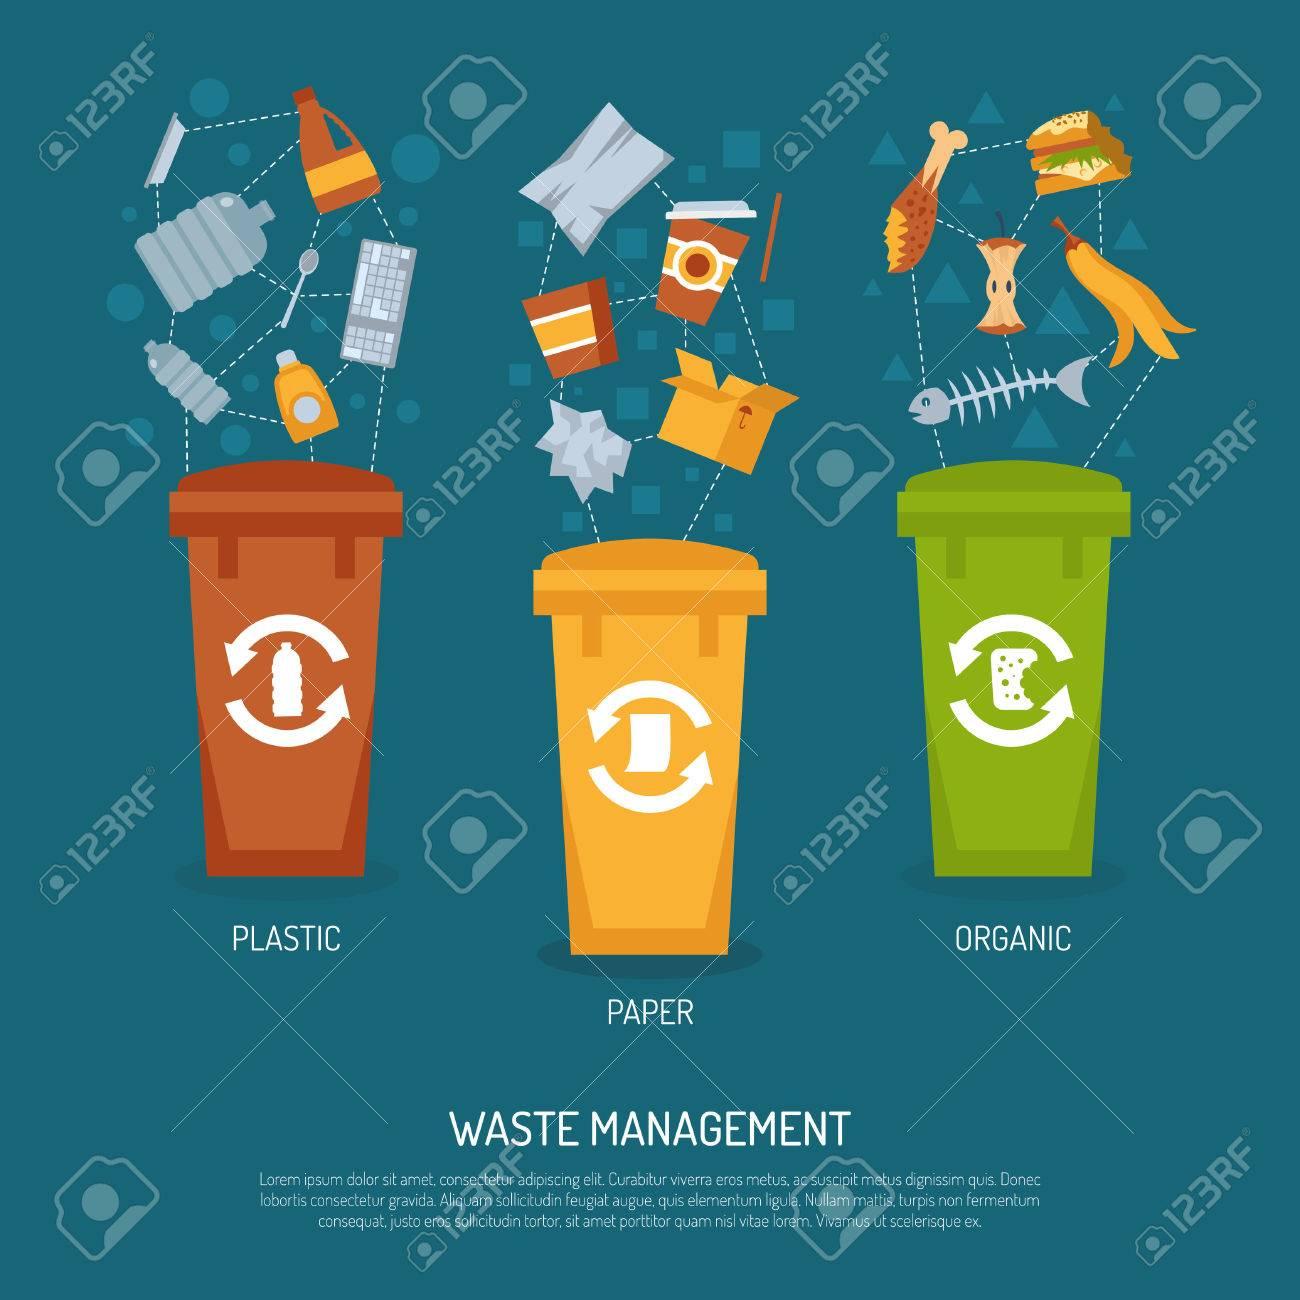 color poster waste management that illustrate garbage sorting